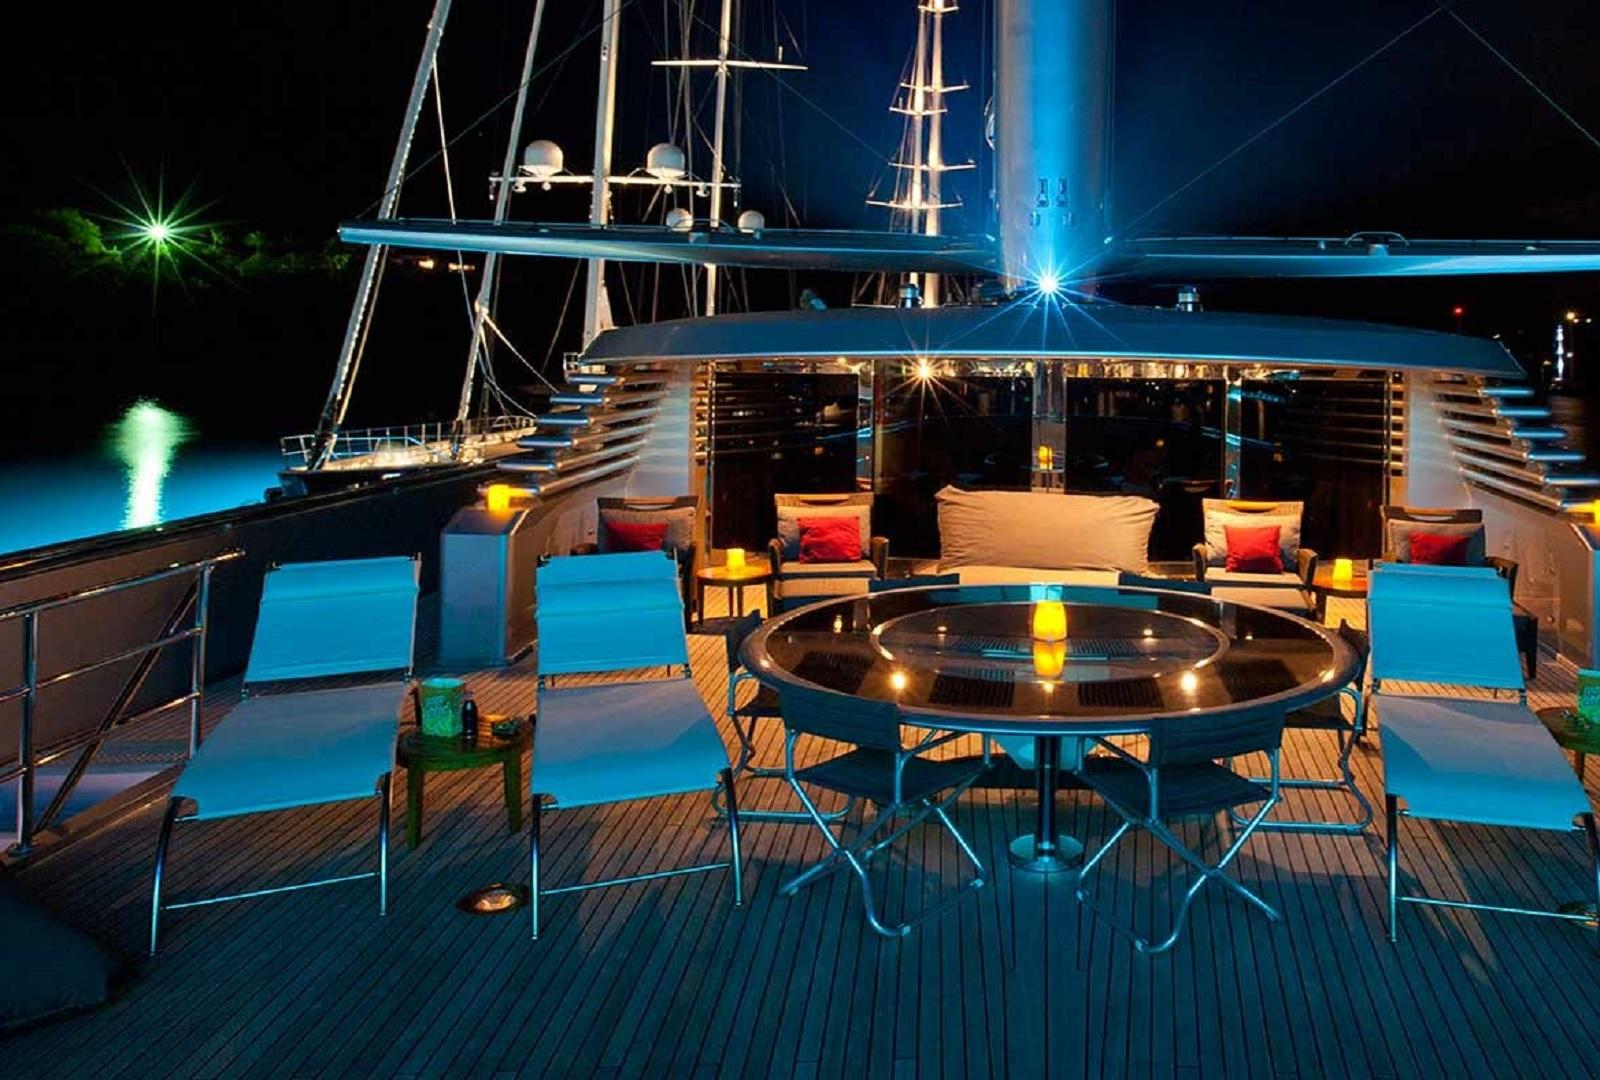 Maltese Falcon Yacht For Charter Perini Navi Yacht For